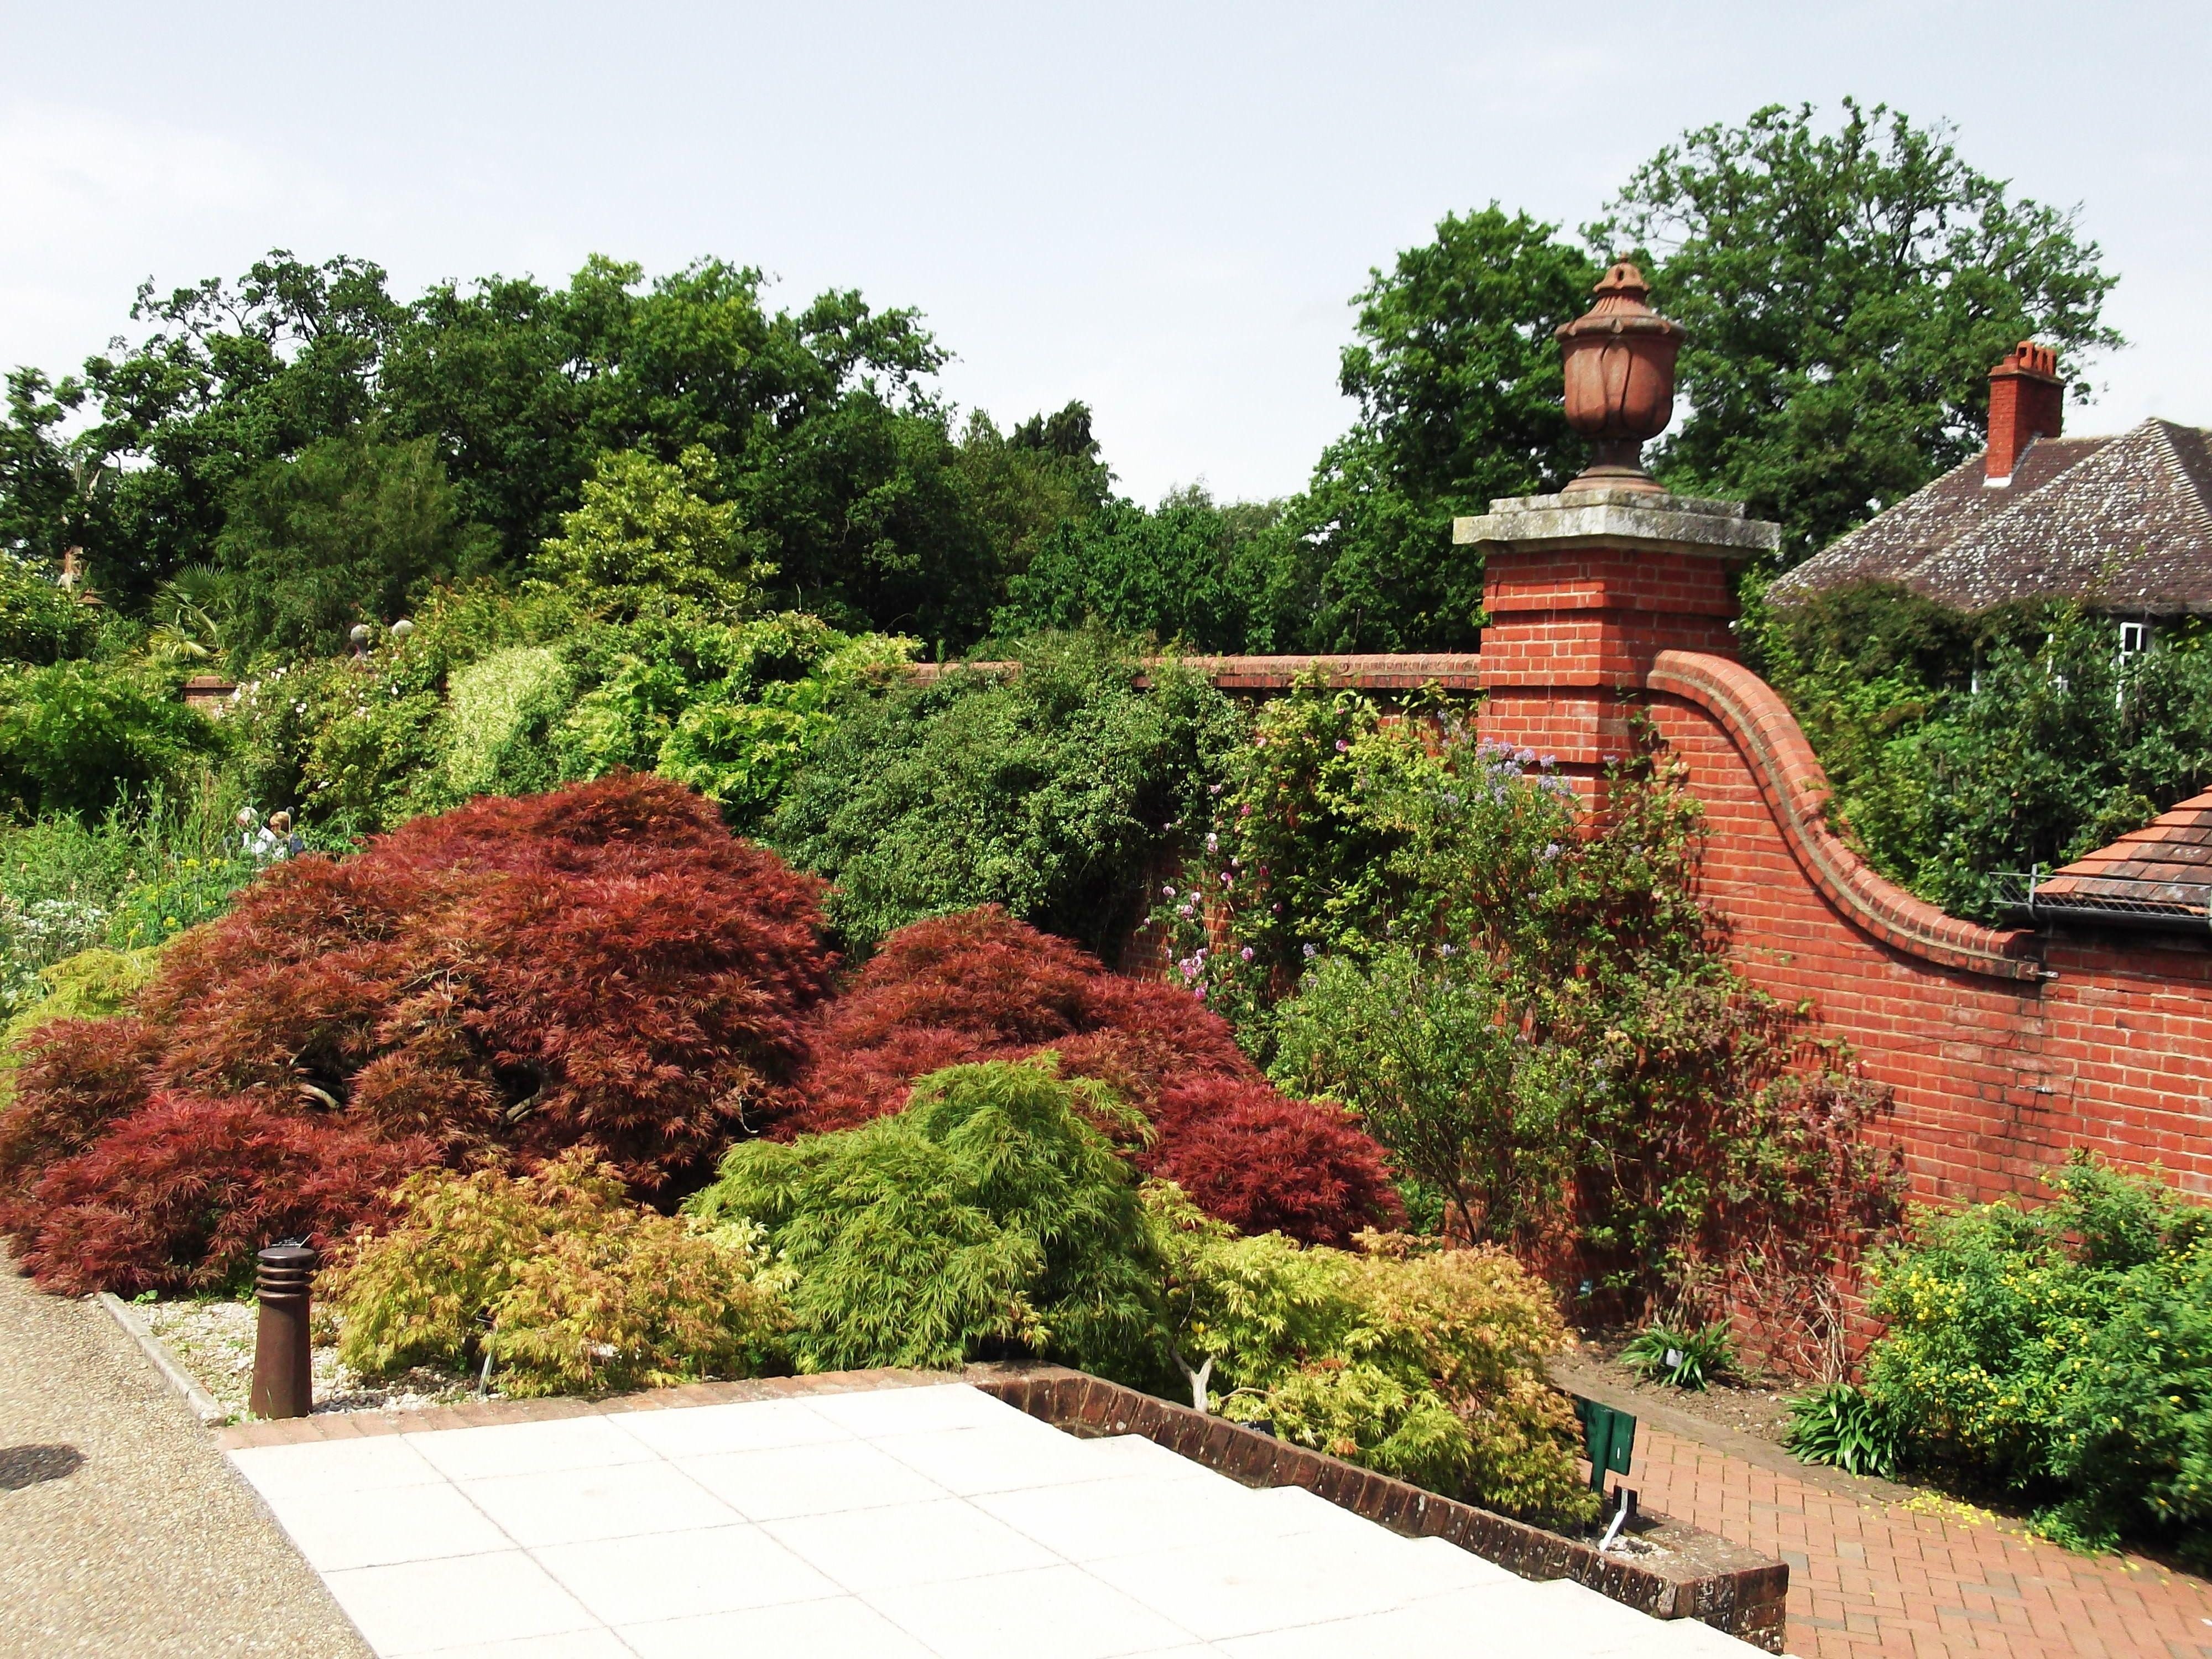 Wall and shrubs at RHS Garden Wisley | Shrubs, Garden, Blossom